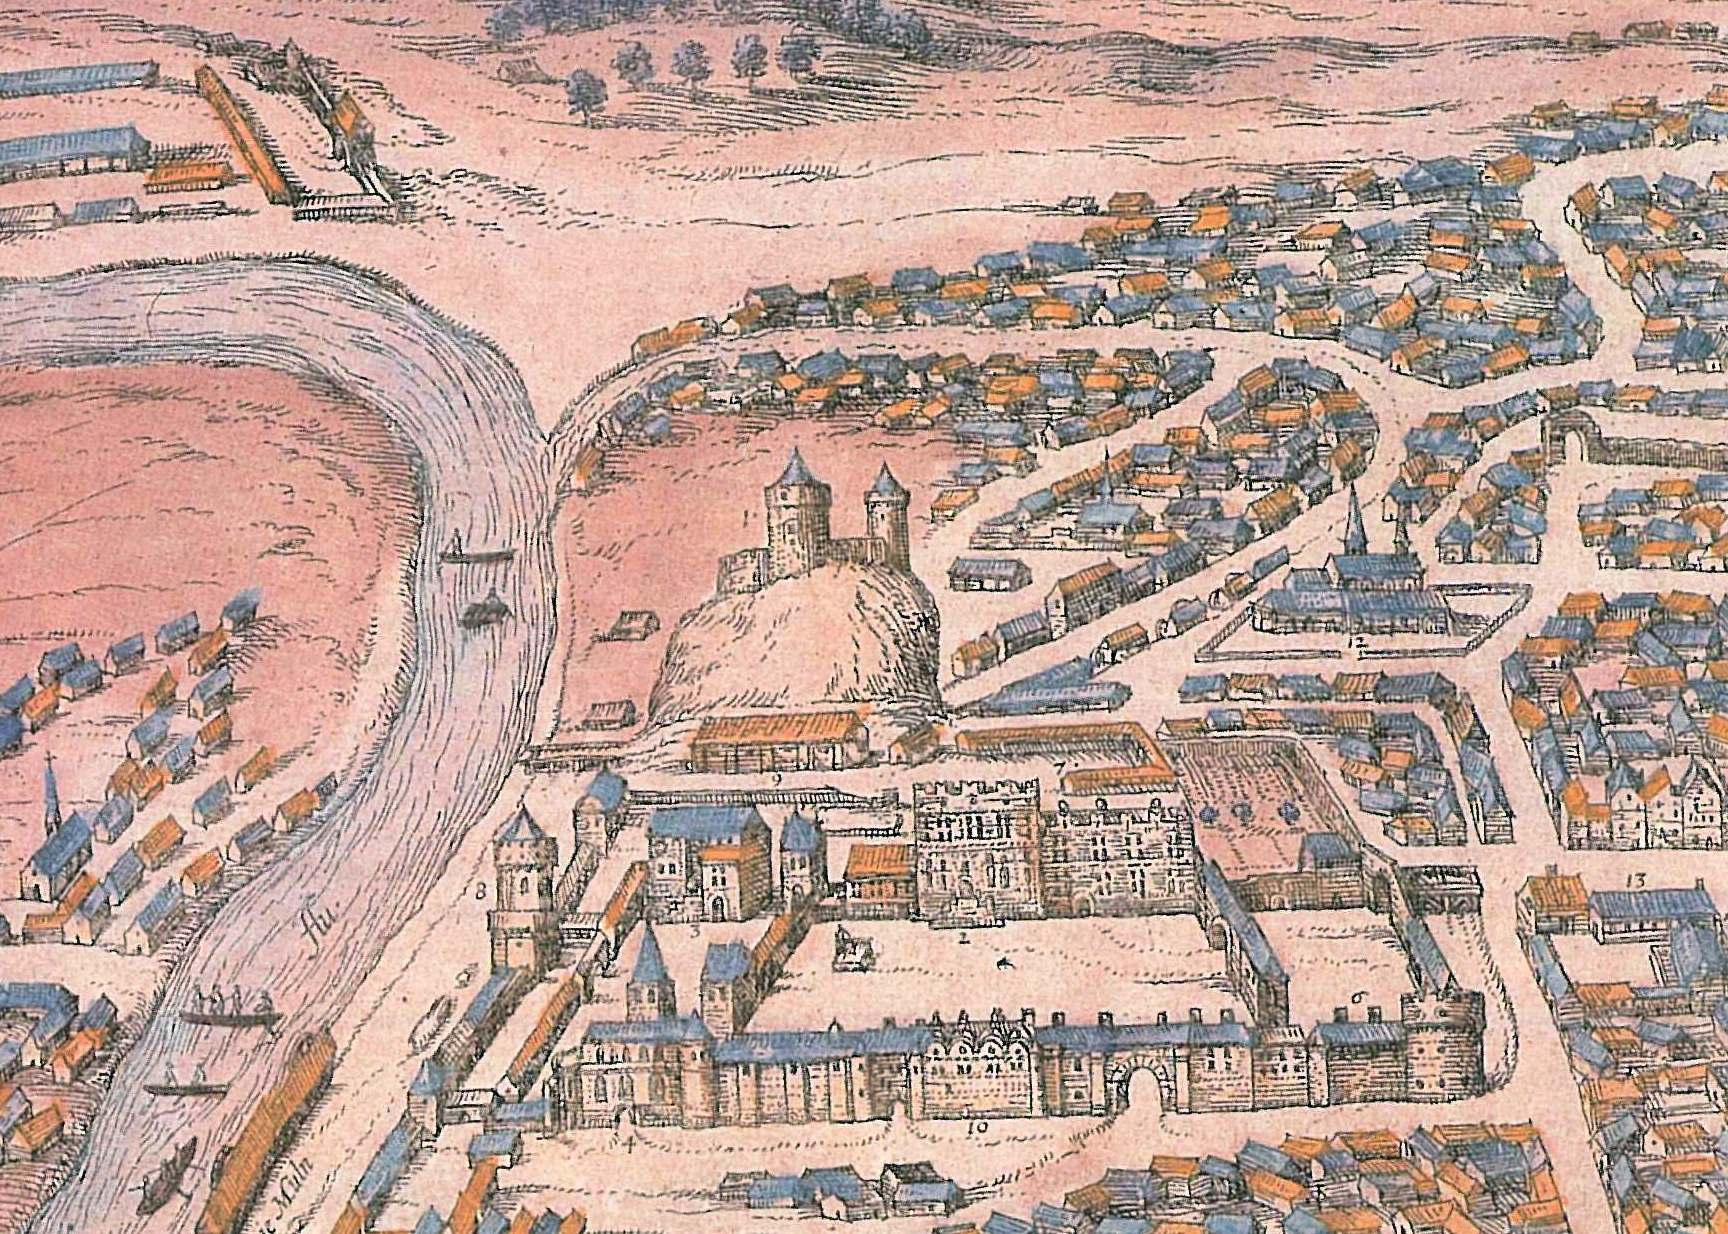 G. Brauno F.Hogenbergo Vilniaus miesto plano fragmentas 1571m.   V.Drėma. Dingęs Vilnius, p.30 1991m.